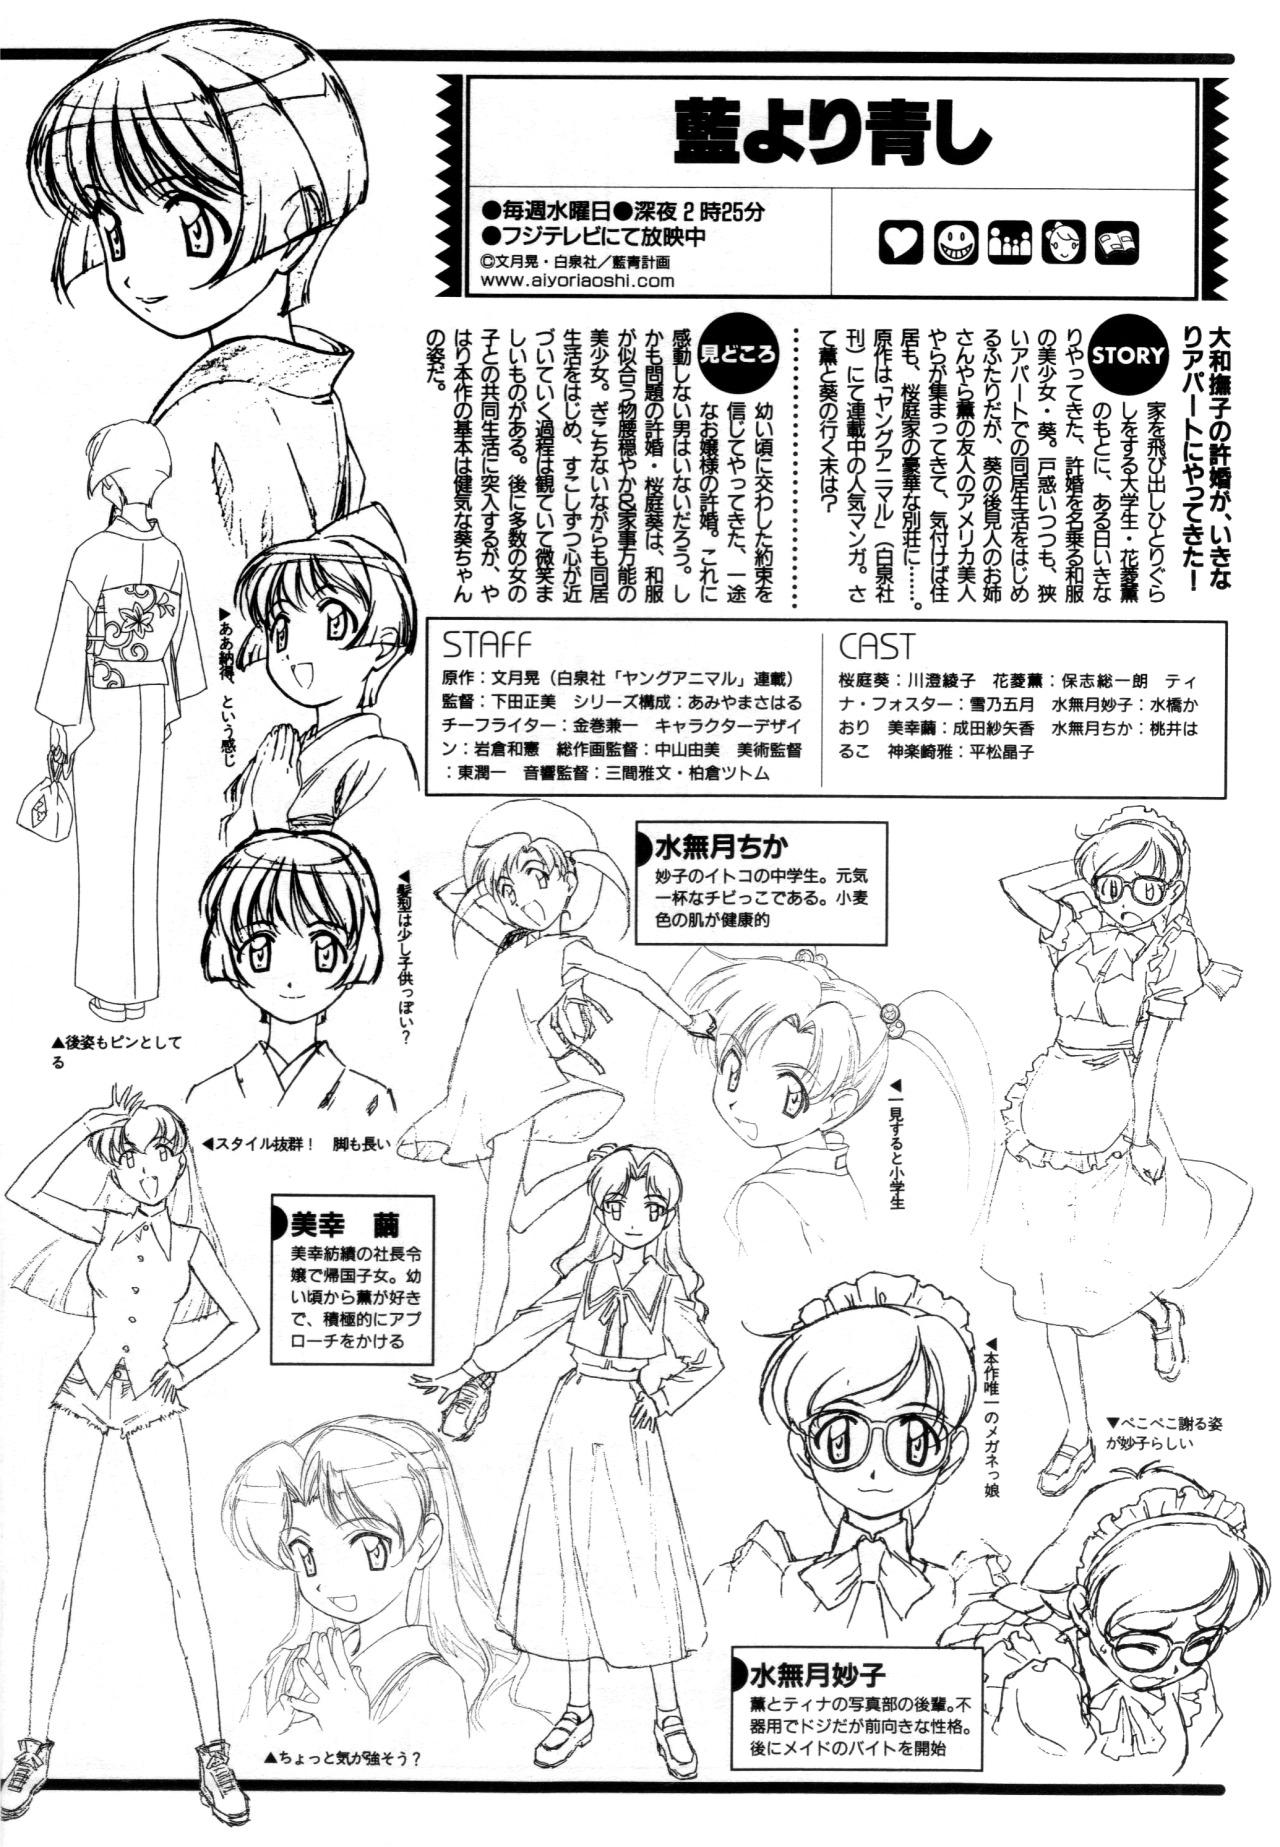 Featured image for Ai Yori Aoshi   / Animage magazine (05/2002)